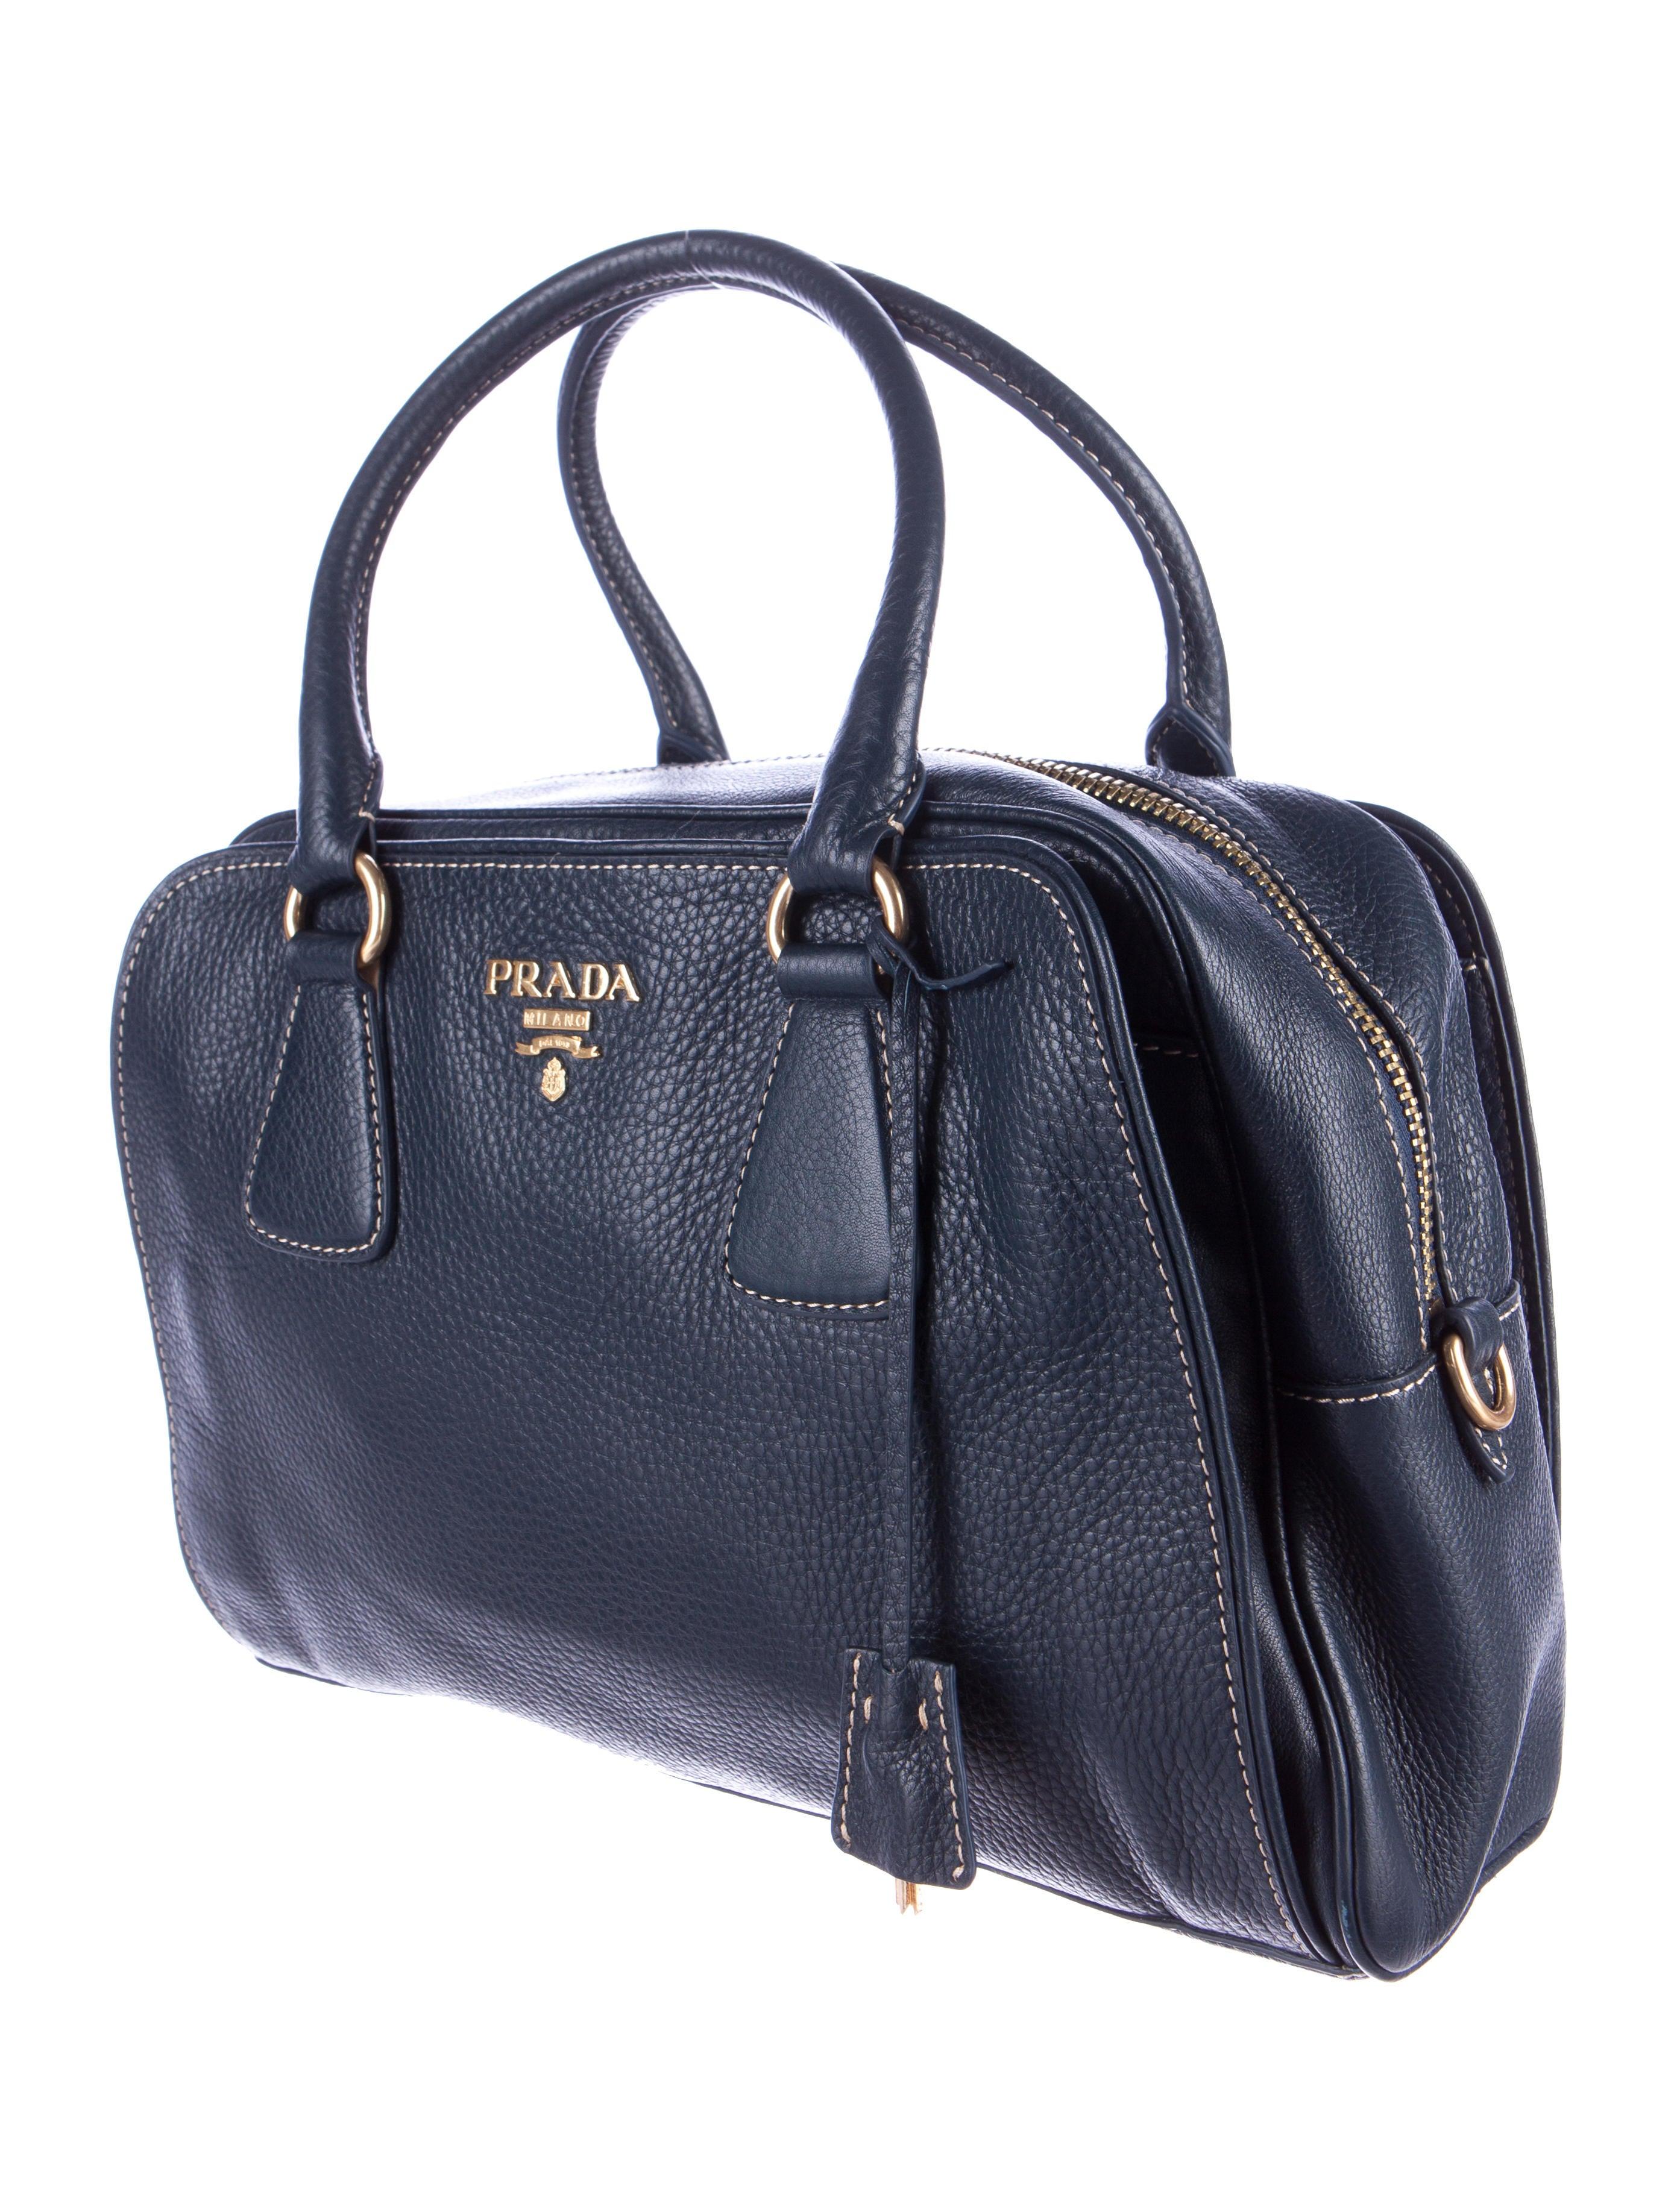 prada vitello daino tote handbags pra146666 the realreal